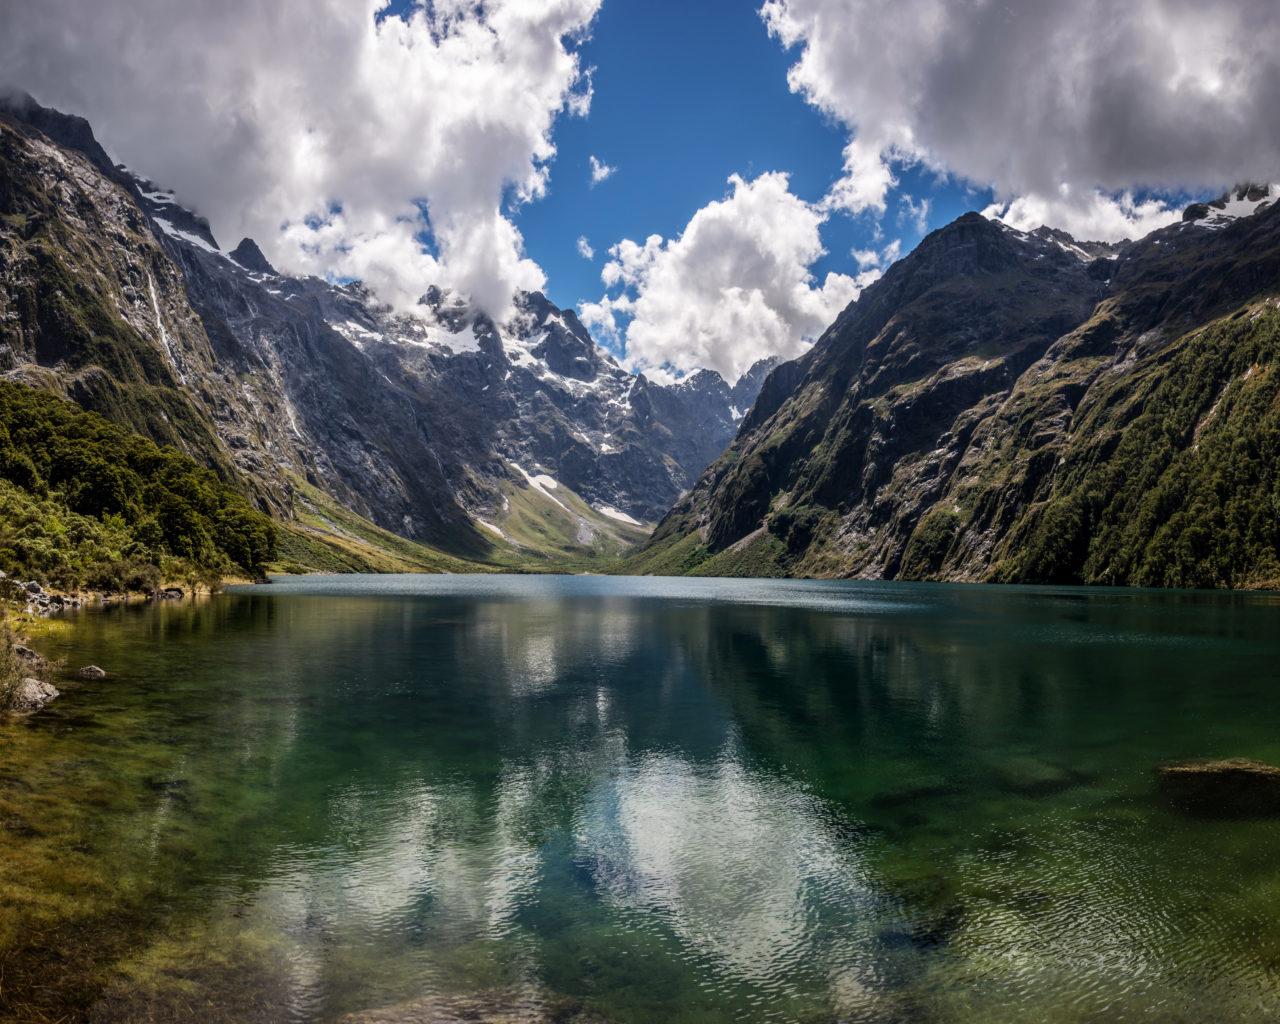 Beautiful Water Fall Scenery Wallpapers Natural Beauty Mountain Lake Marian New Zealand Hd